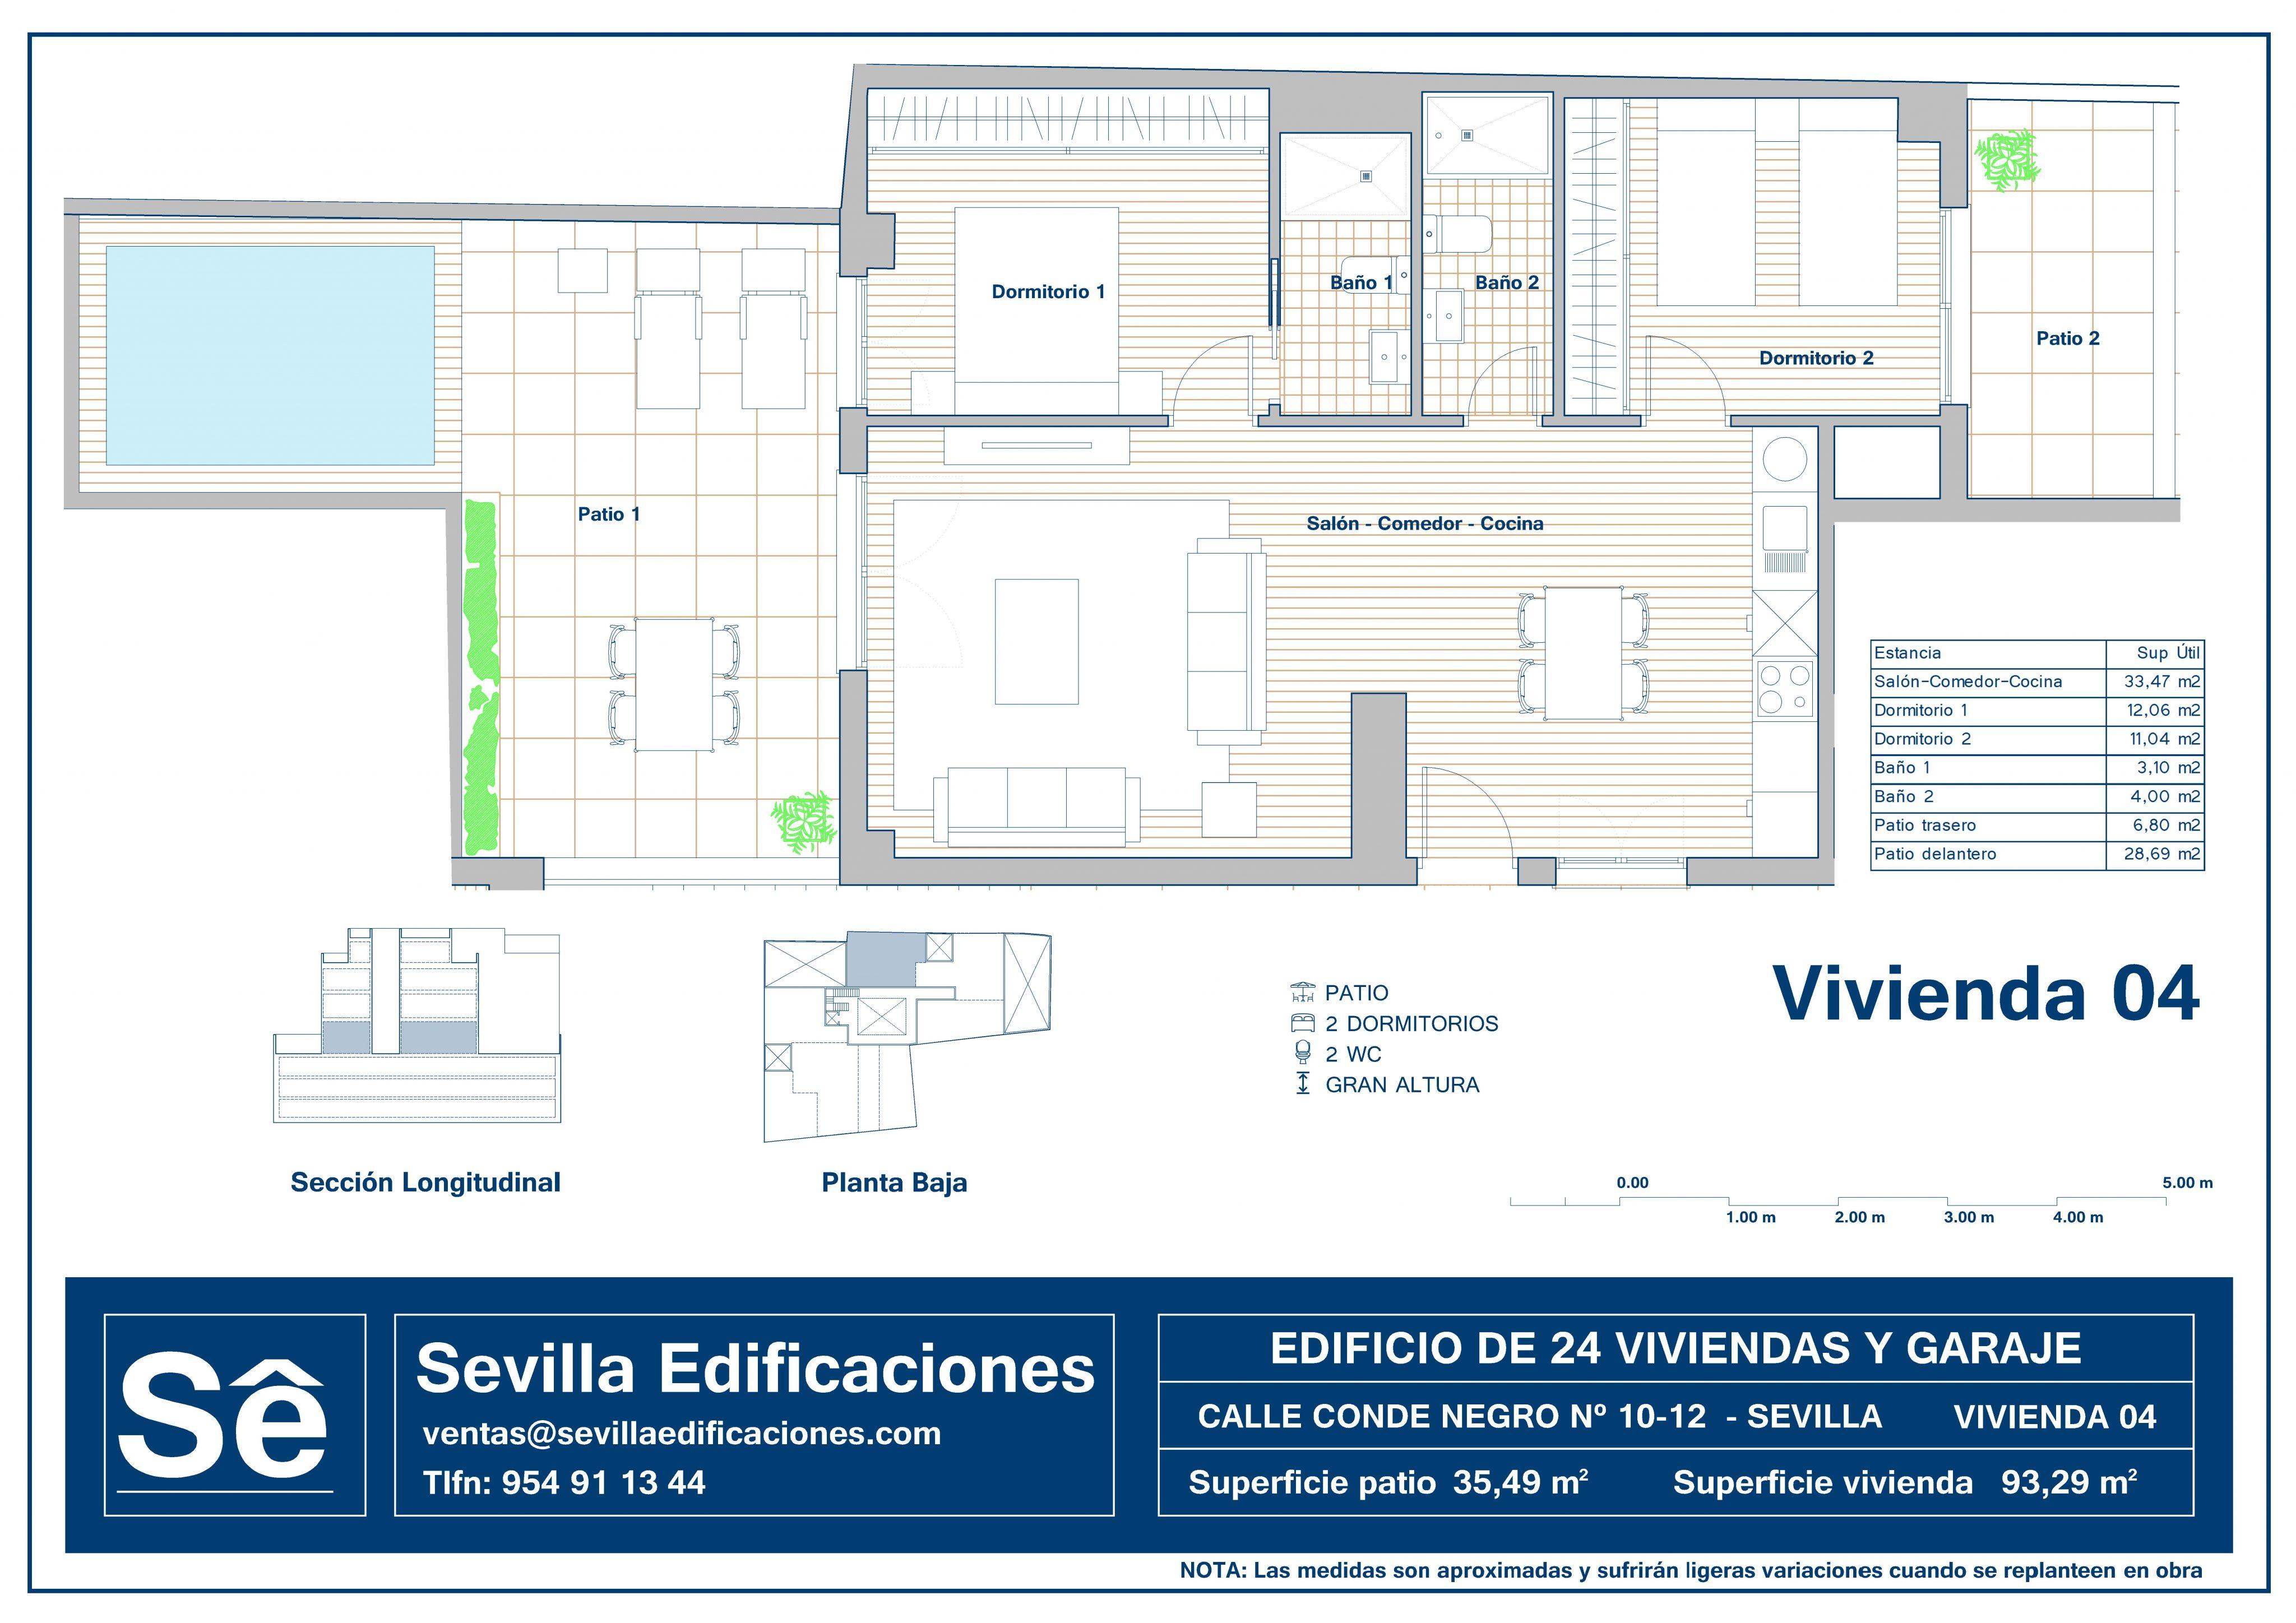 CONDENEGRO_VIVIENDA_04